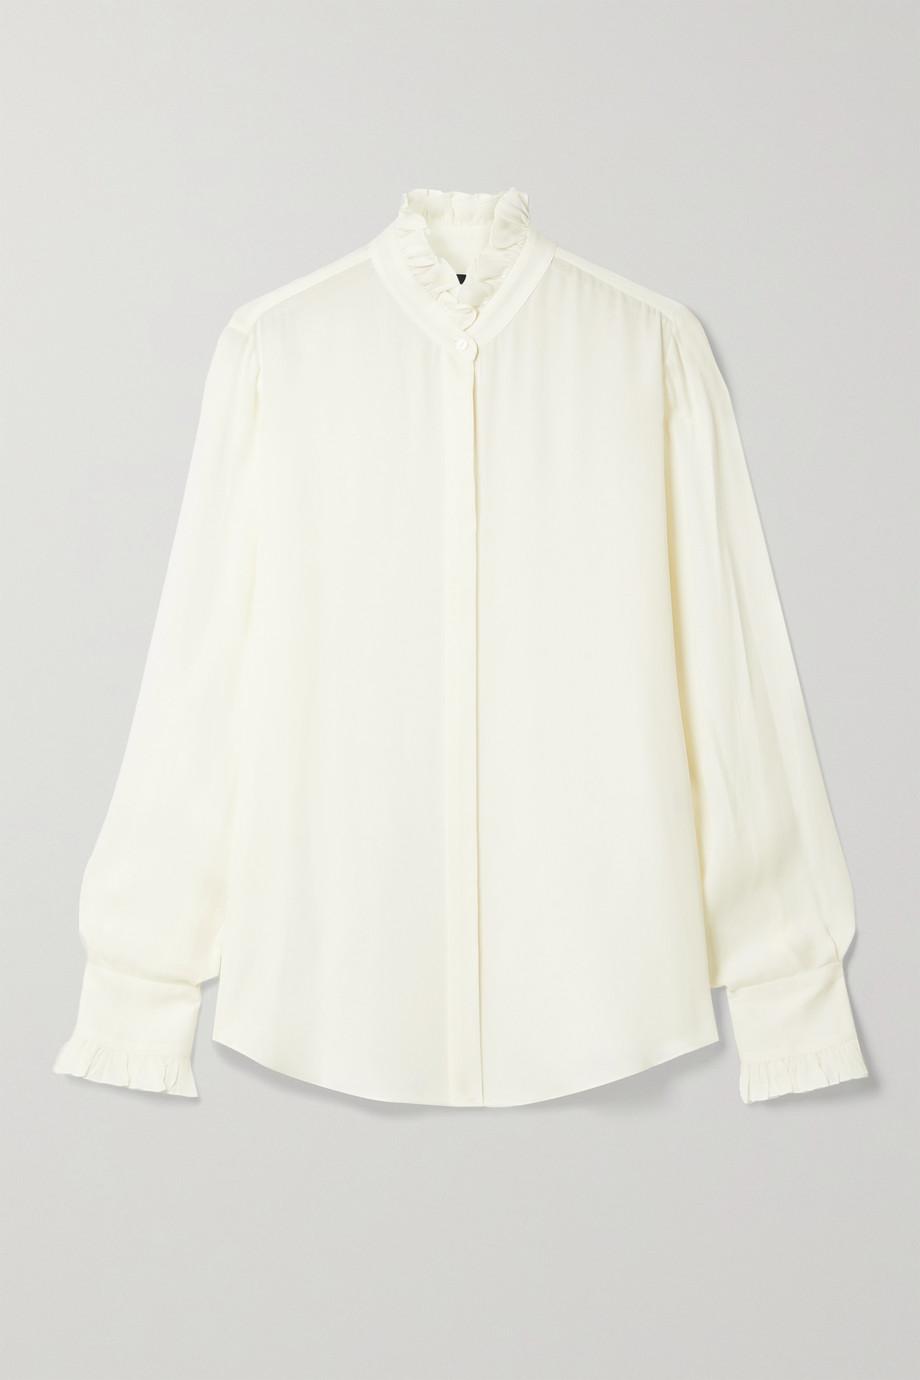 Nili Lotan Aleia ruffled silk-chiffon shirt